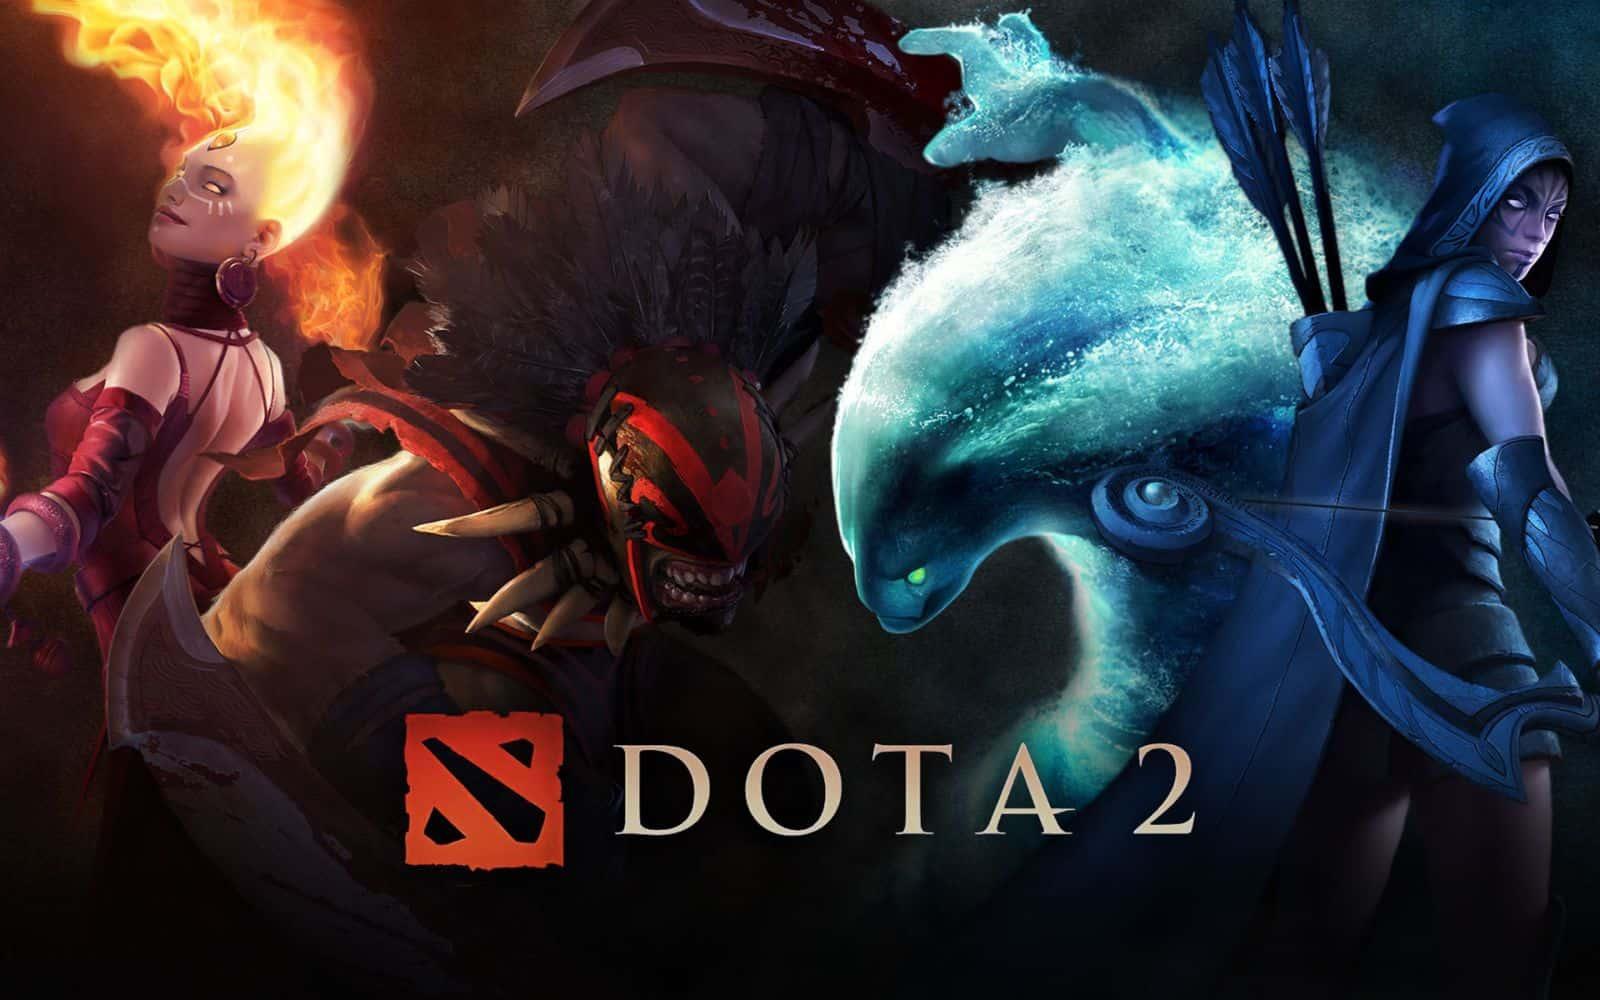 Dota 2 PC Download free full game for windows